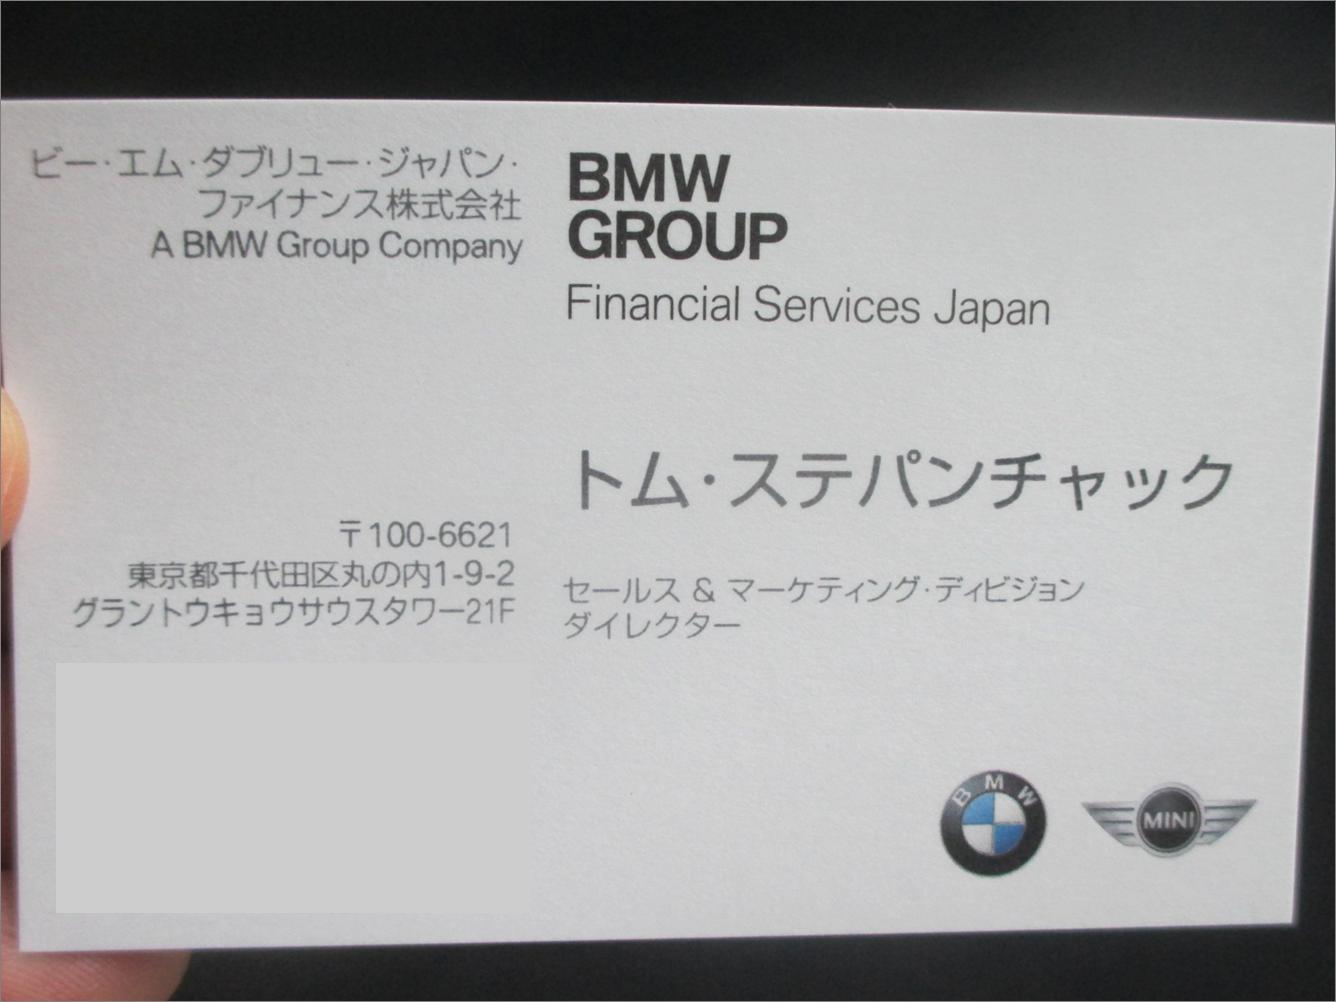 Beautiful Business Cards Japan Contemporary - Business Card Ideas ...